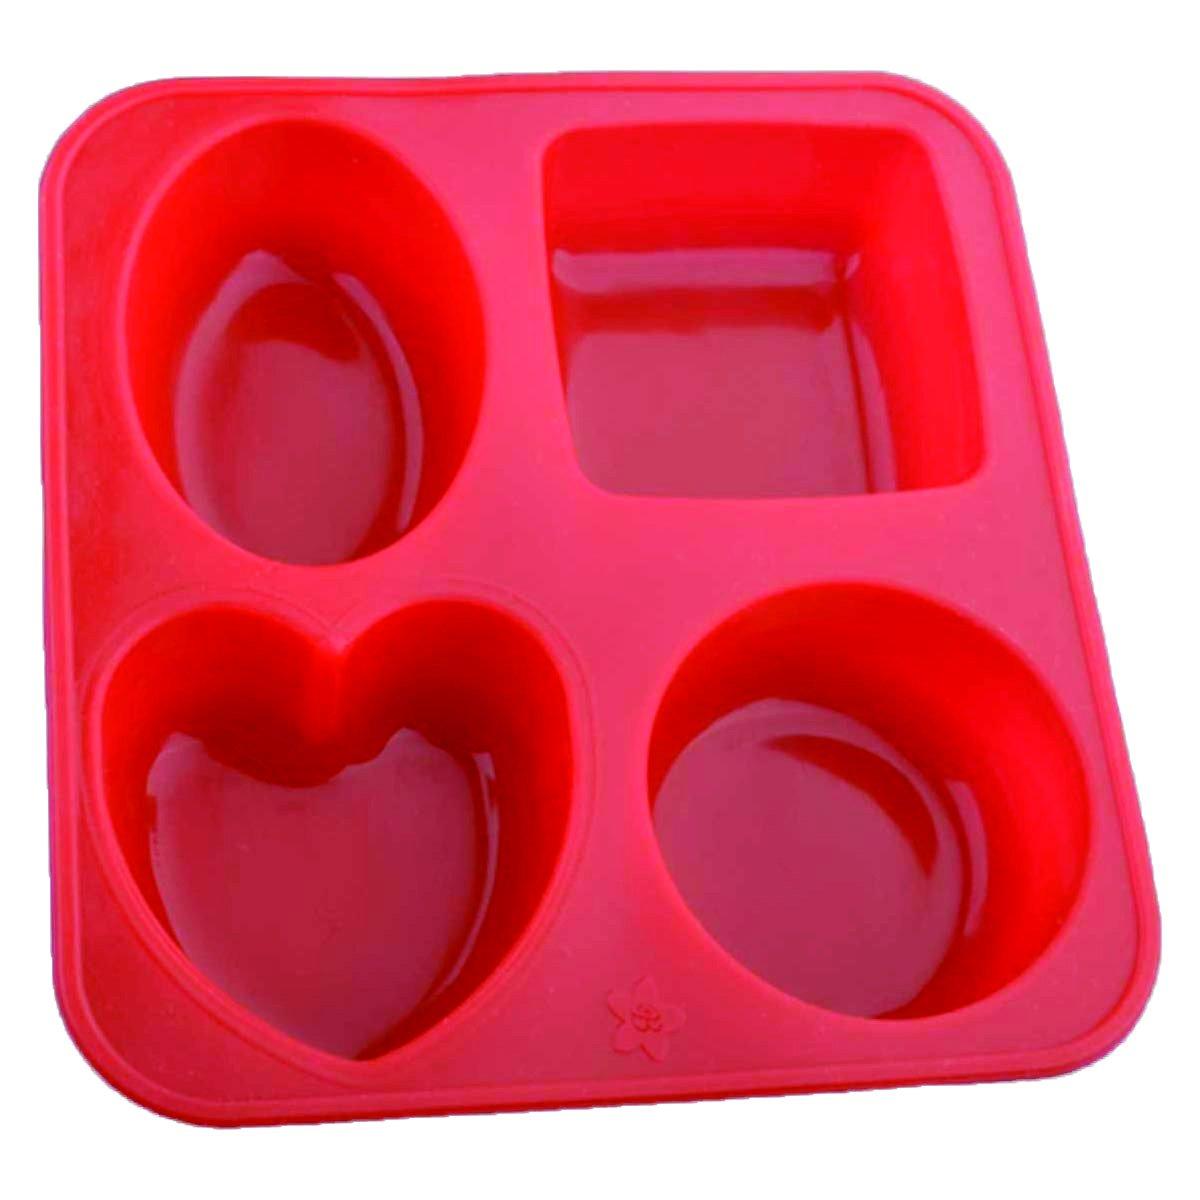 Silicone Circle, Square, Oval and Heart Shape Soap And Mini Cake Making Mould - Unnati Enterprises